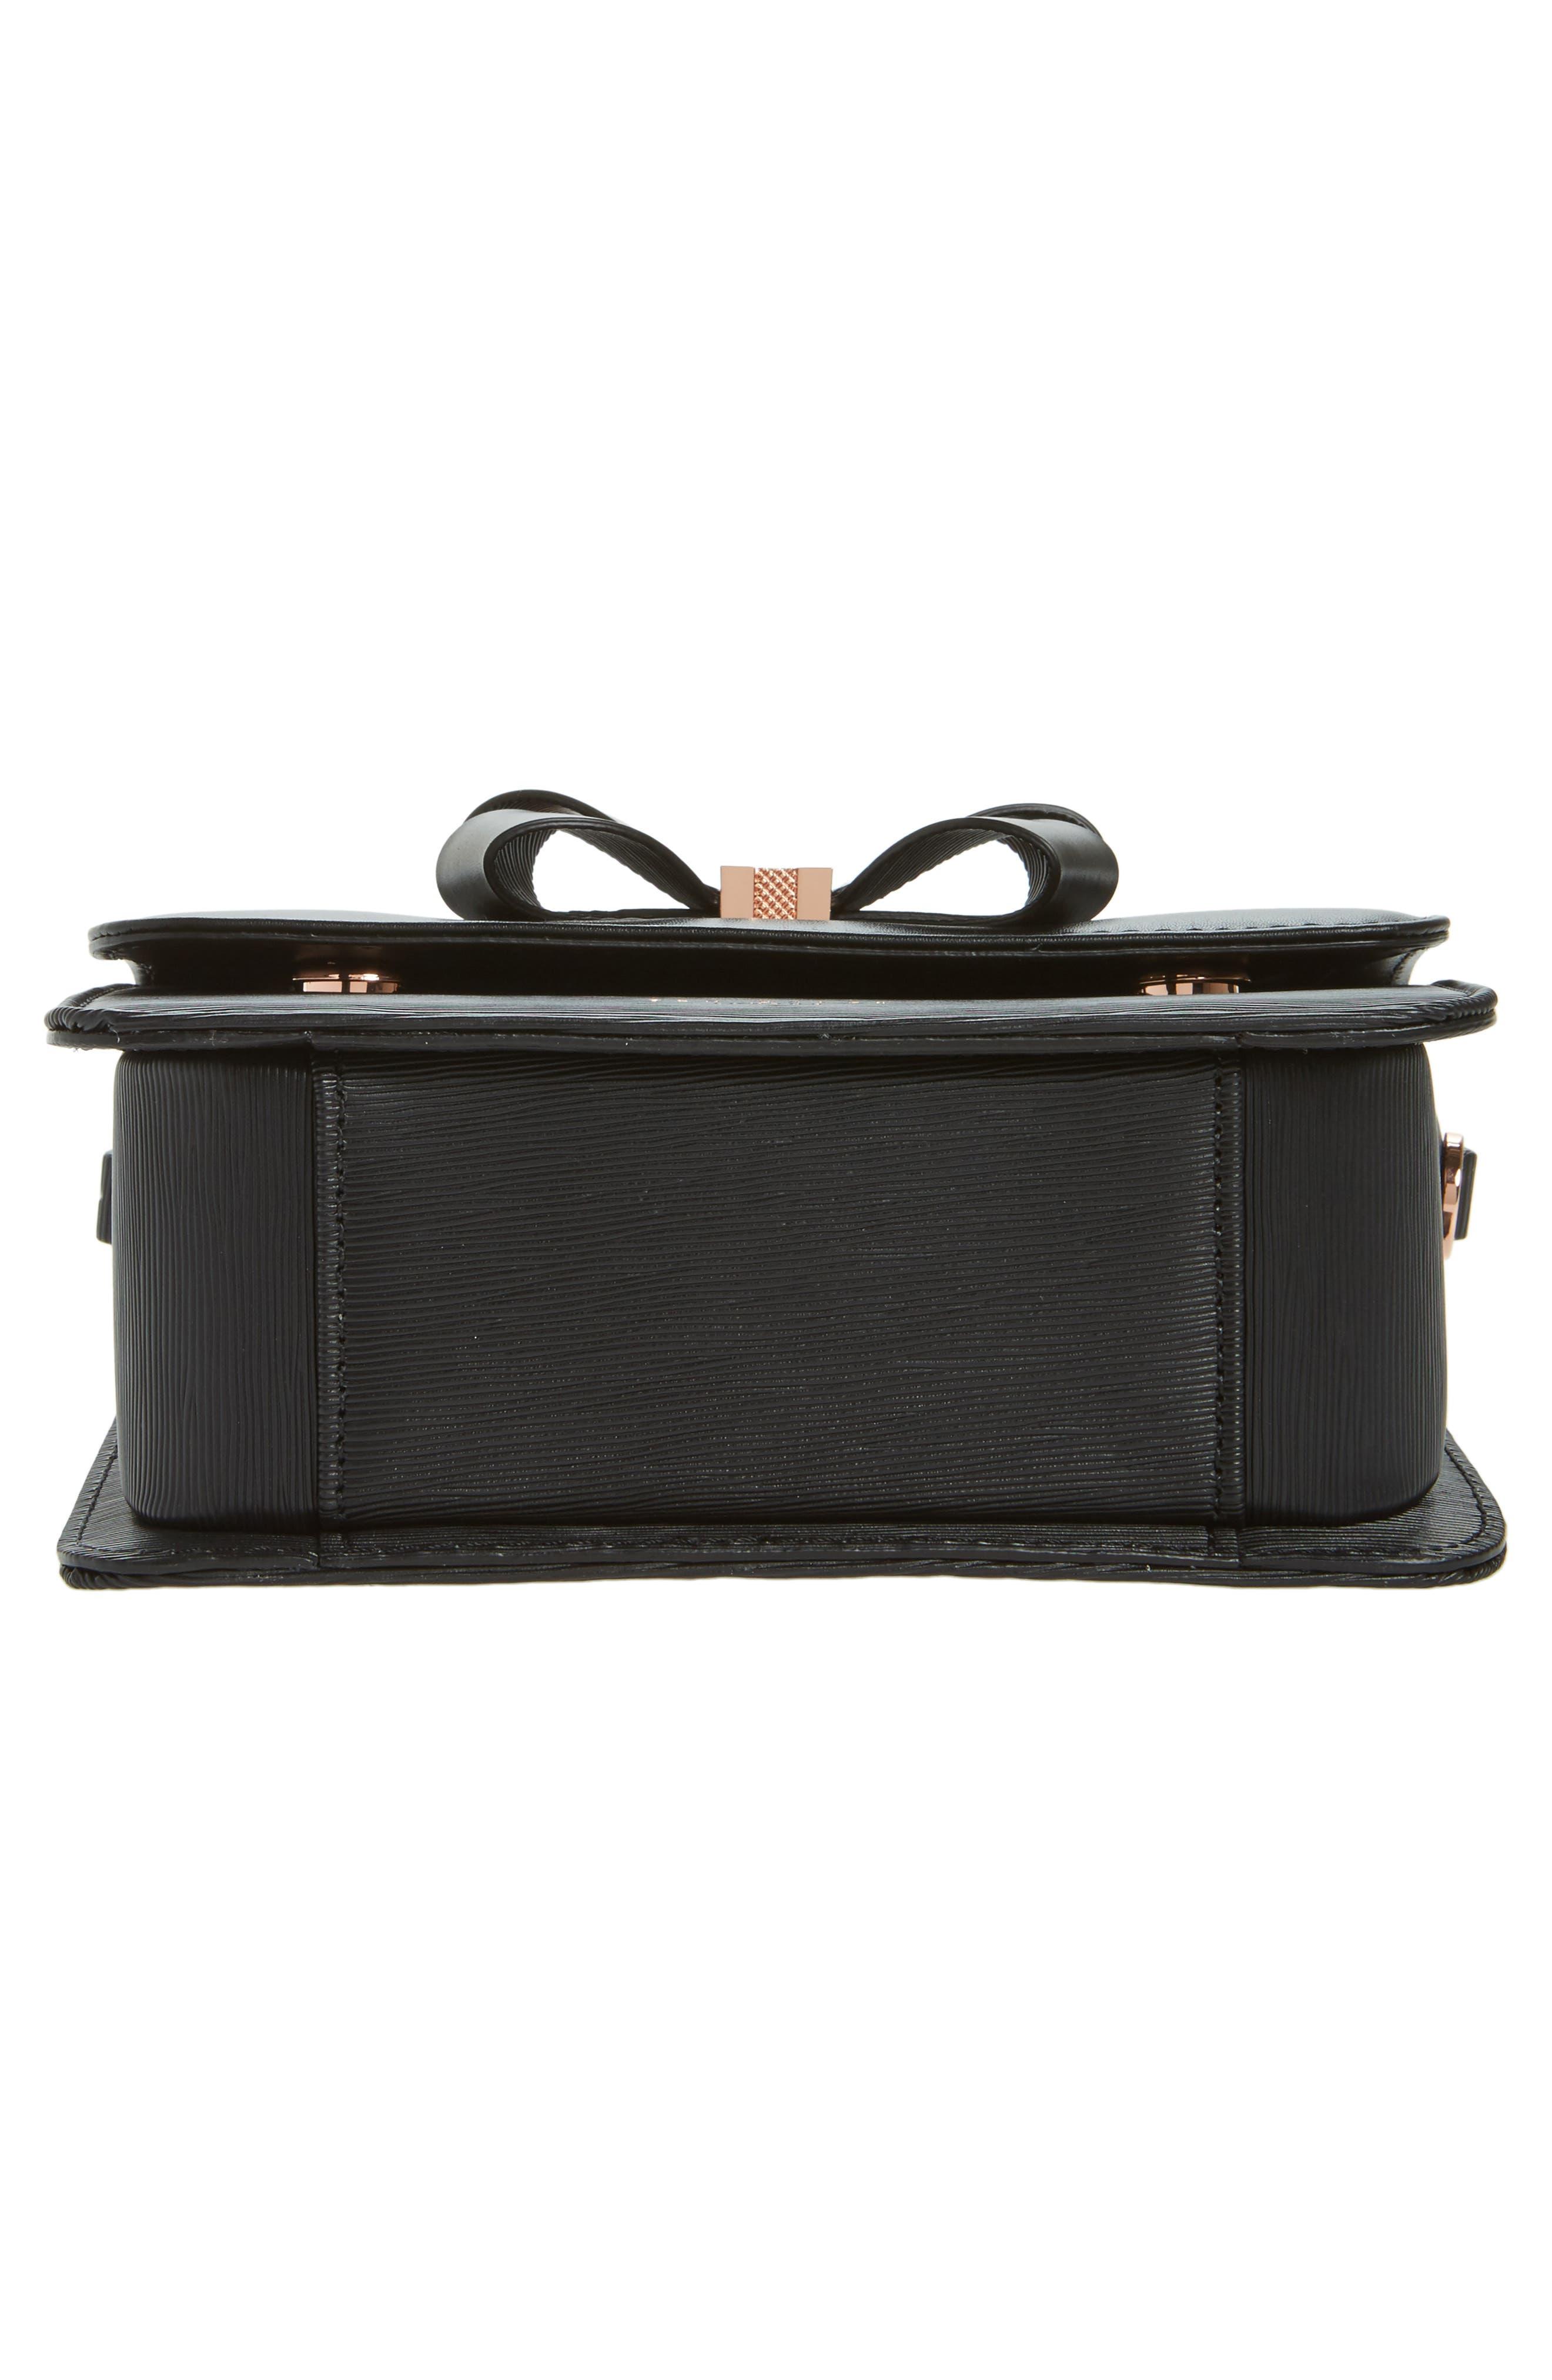 Callih Bow Leather Crossbody Bag,                             Alternate thumbnail 6, color,                             001